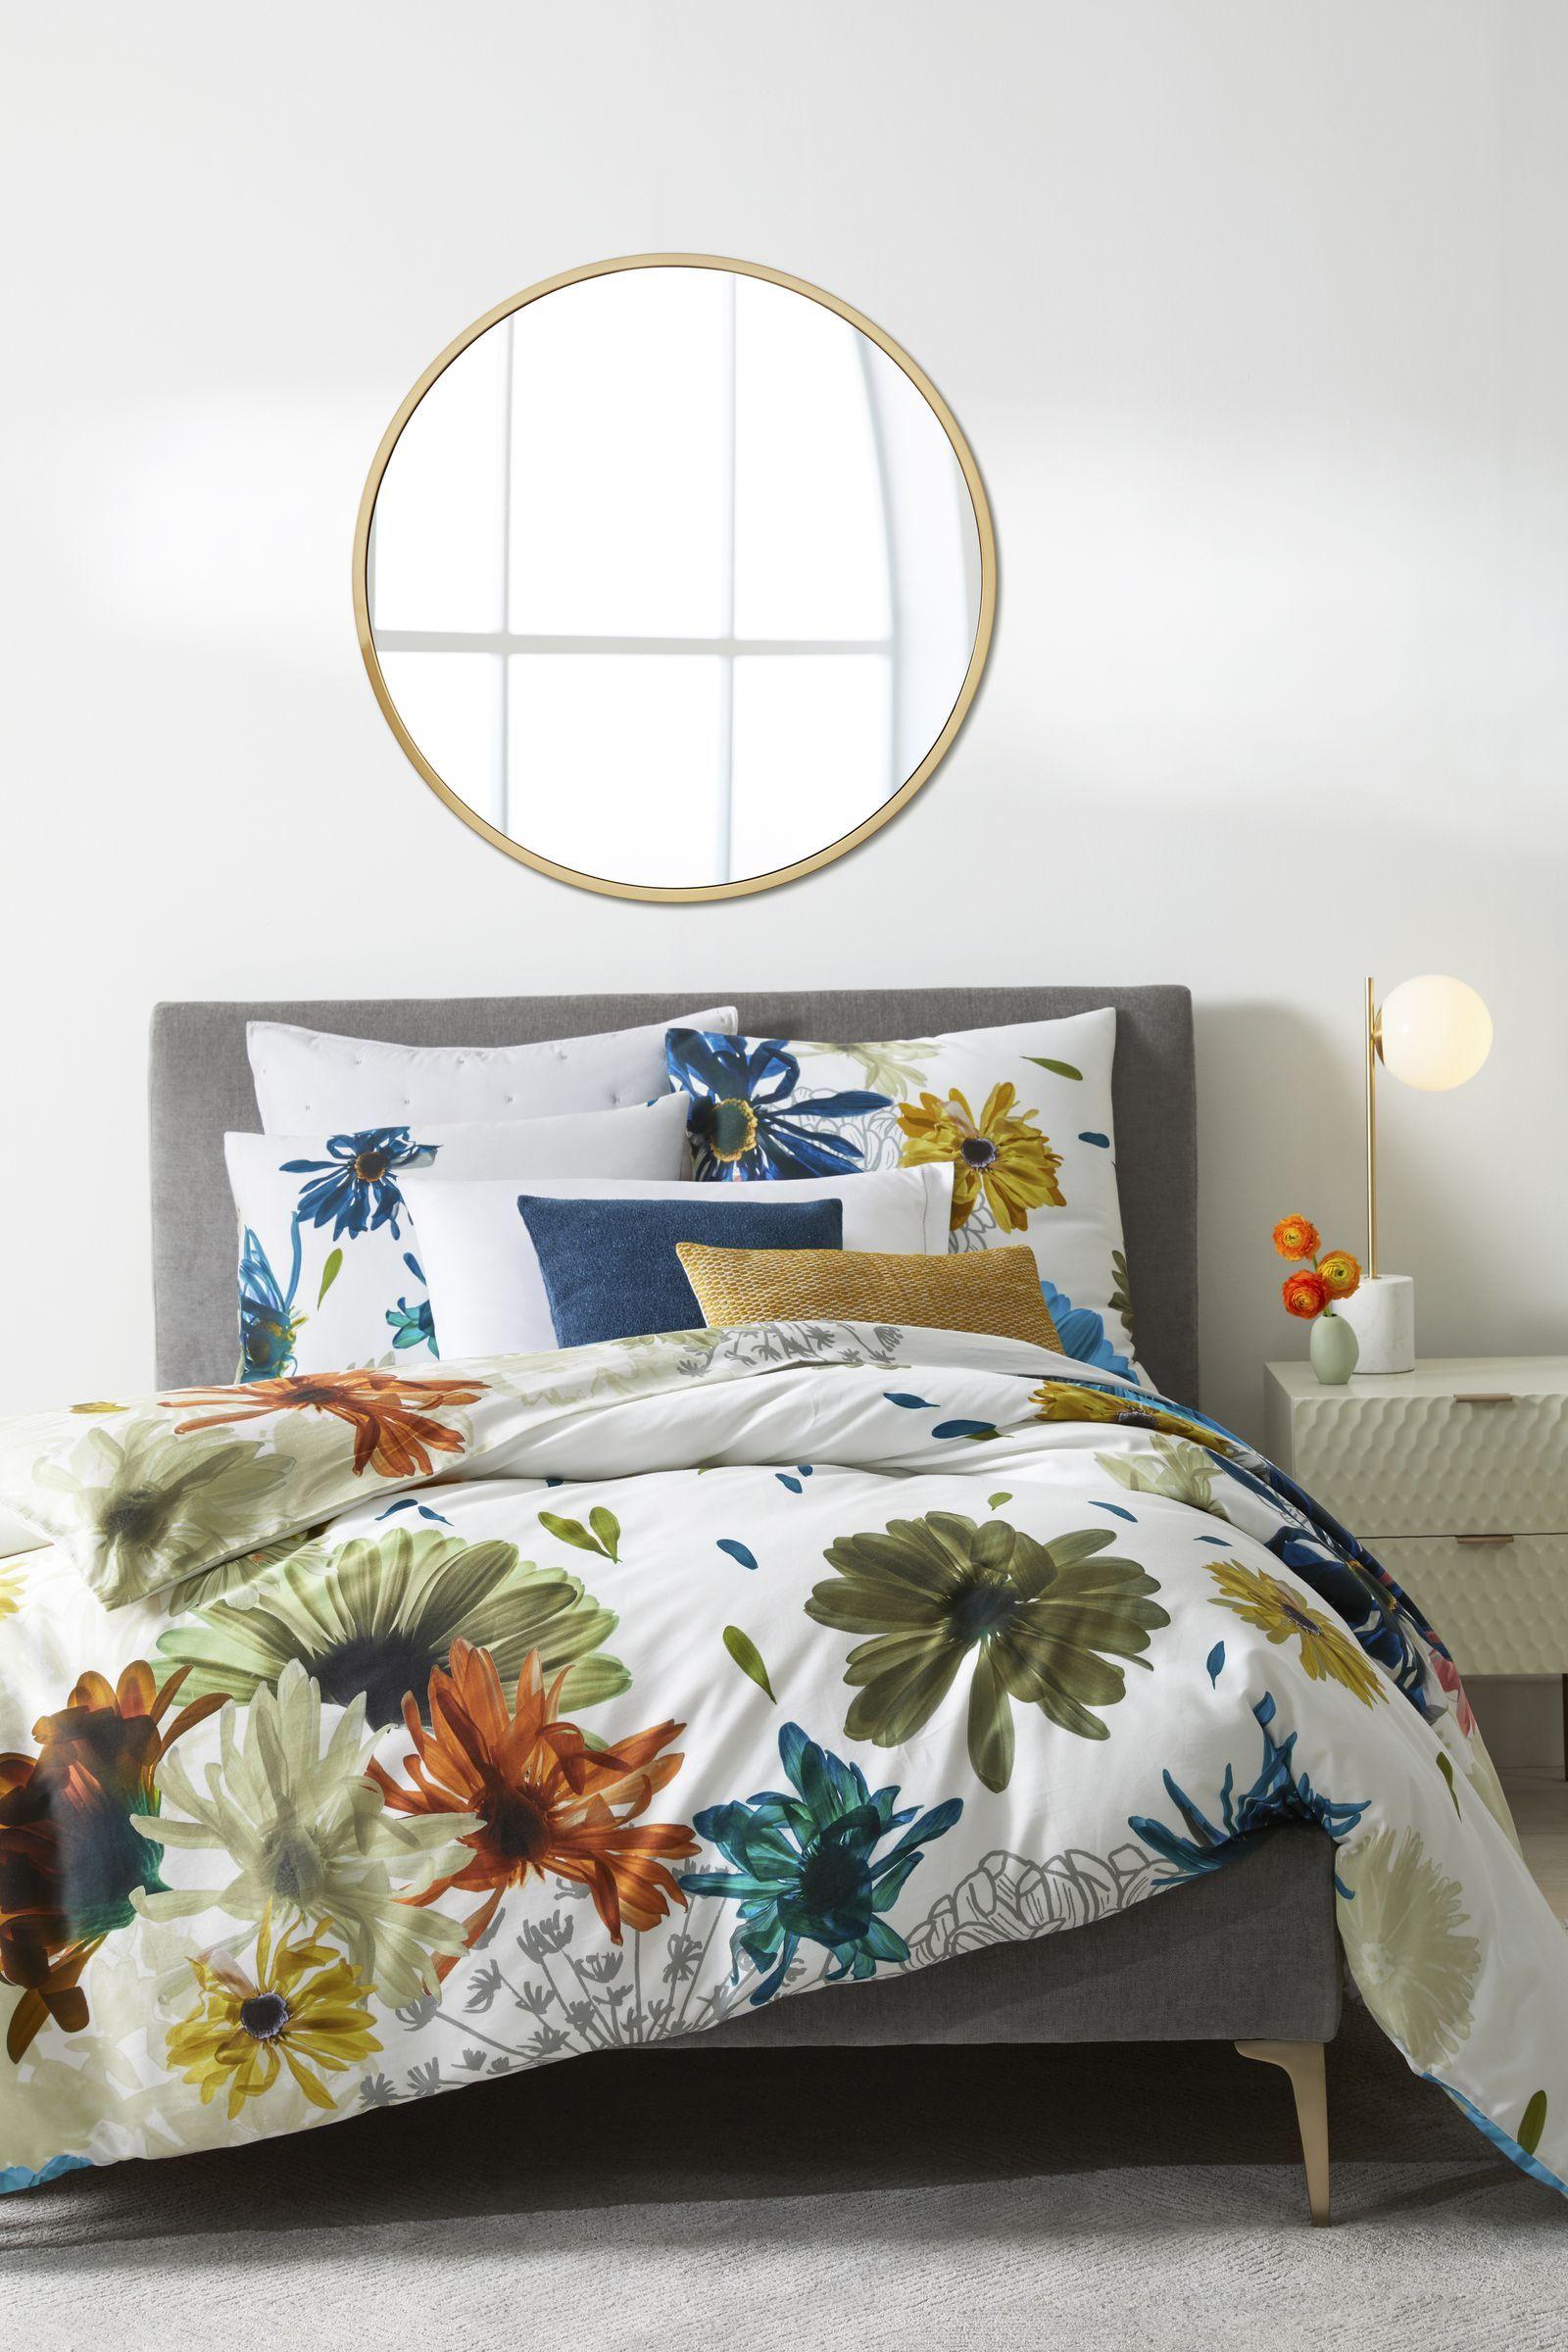 Your Organic Bedroom: The Biggest Bedroom Trends For 2018